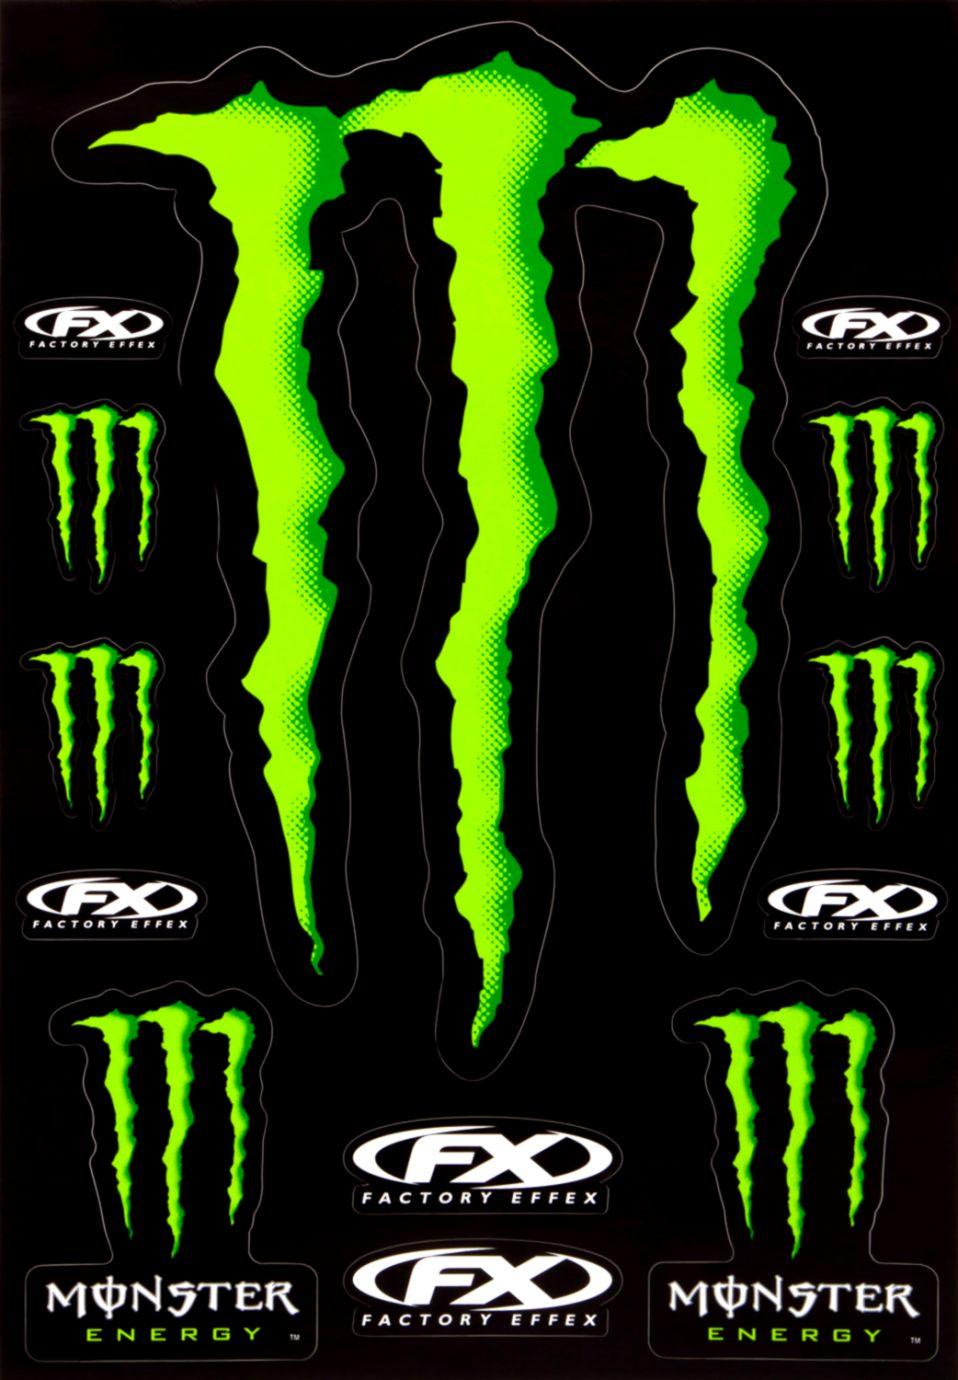 Monster Energy Sticker Images Wallpapers Design